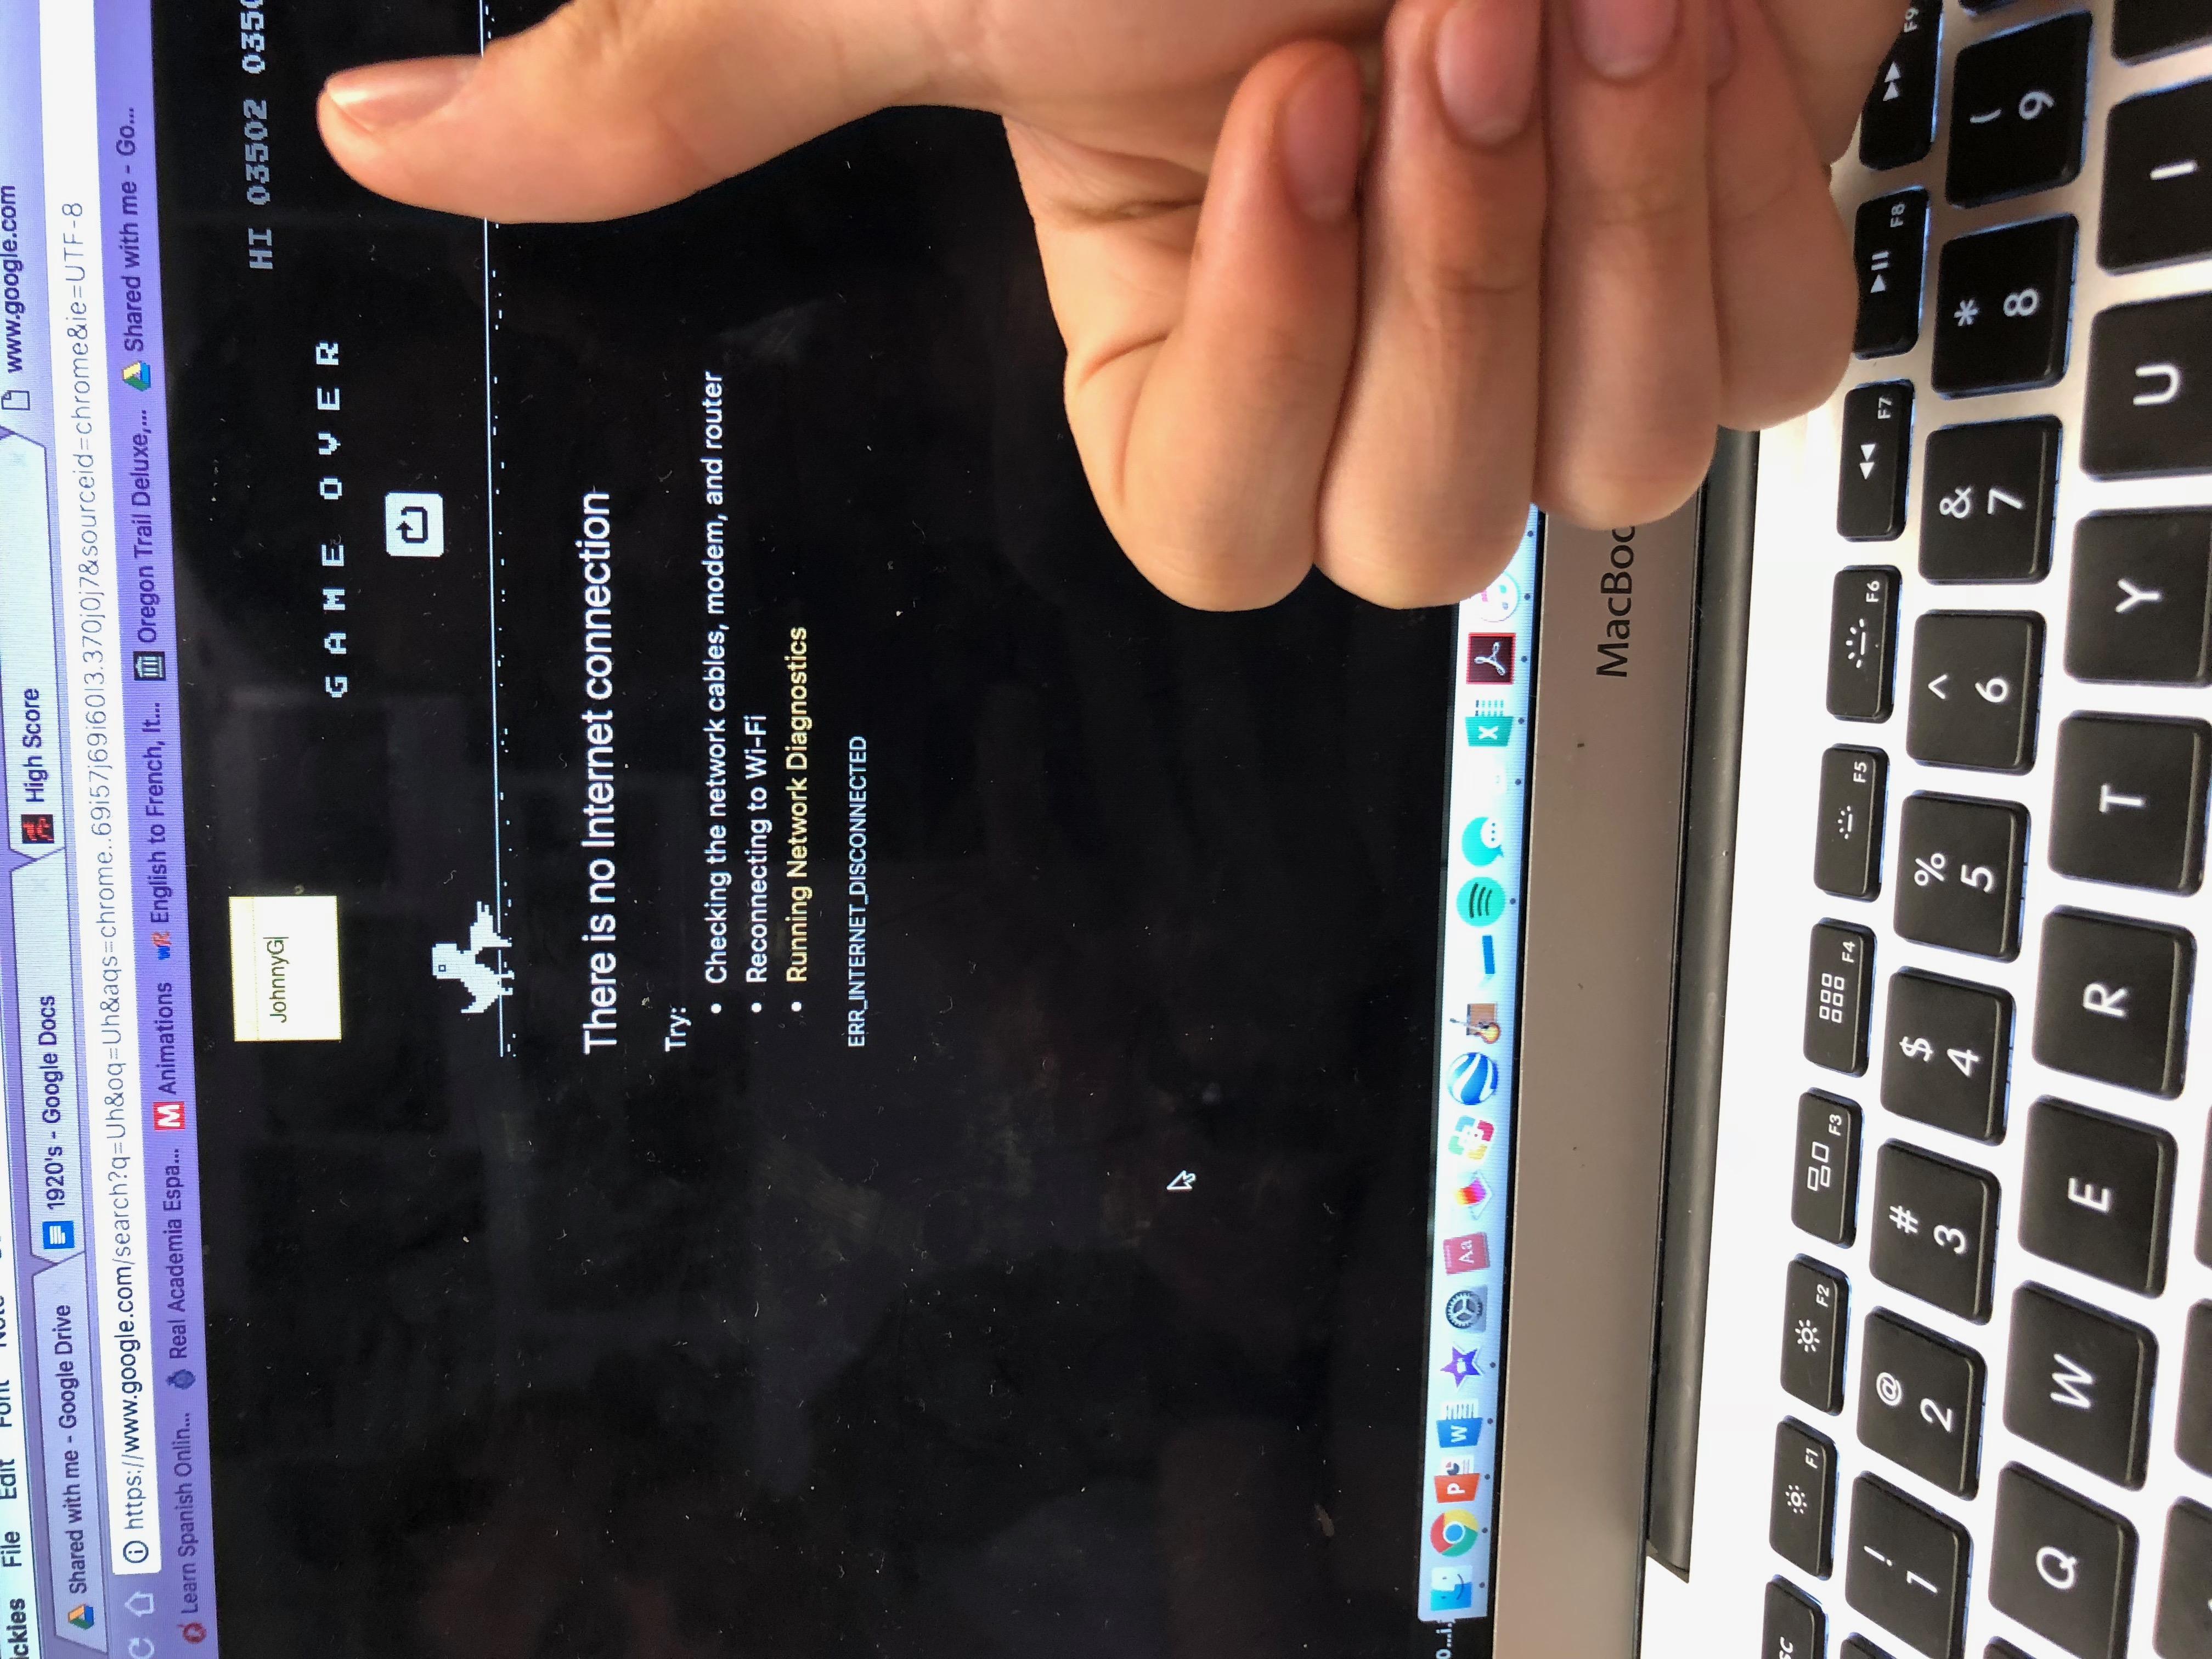 Dino Run [Google Chrome Offline] (Web) high score by JohnnyG